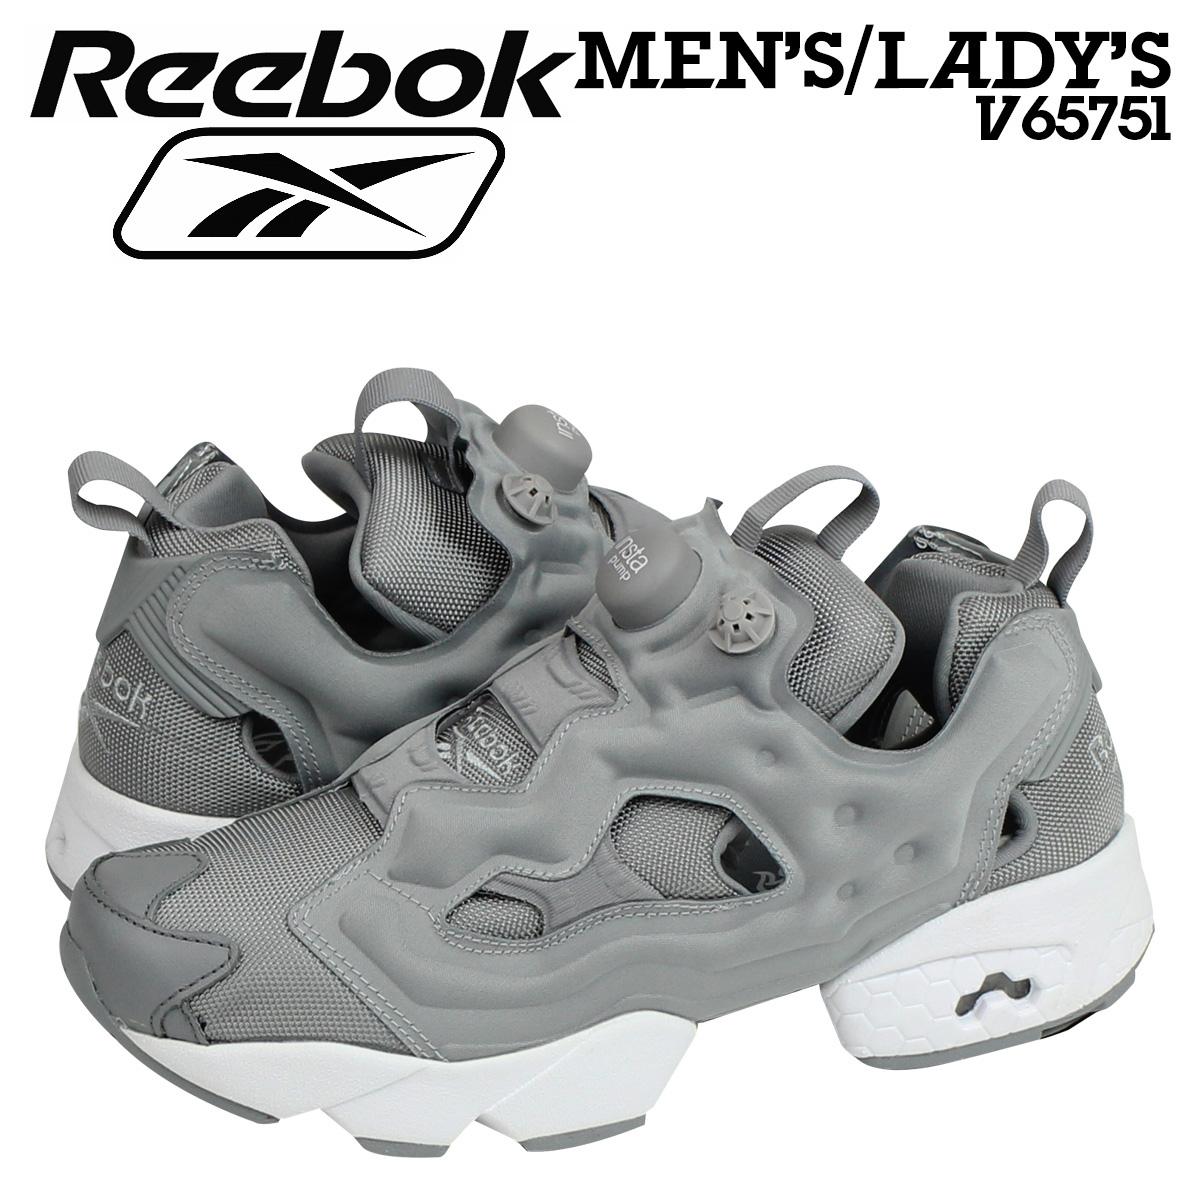 Reebok Reebok insta pump fury sneakers INSTAPUMP FURY OG V65751 men s  women s shoes grey 19633d880